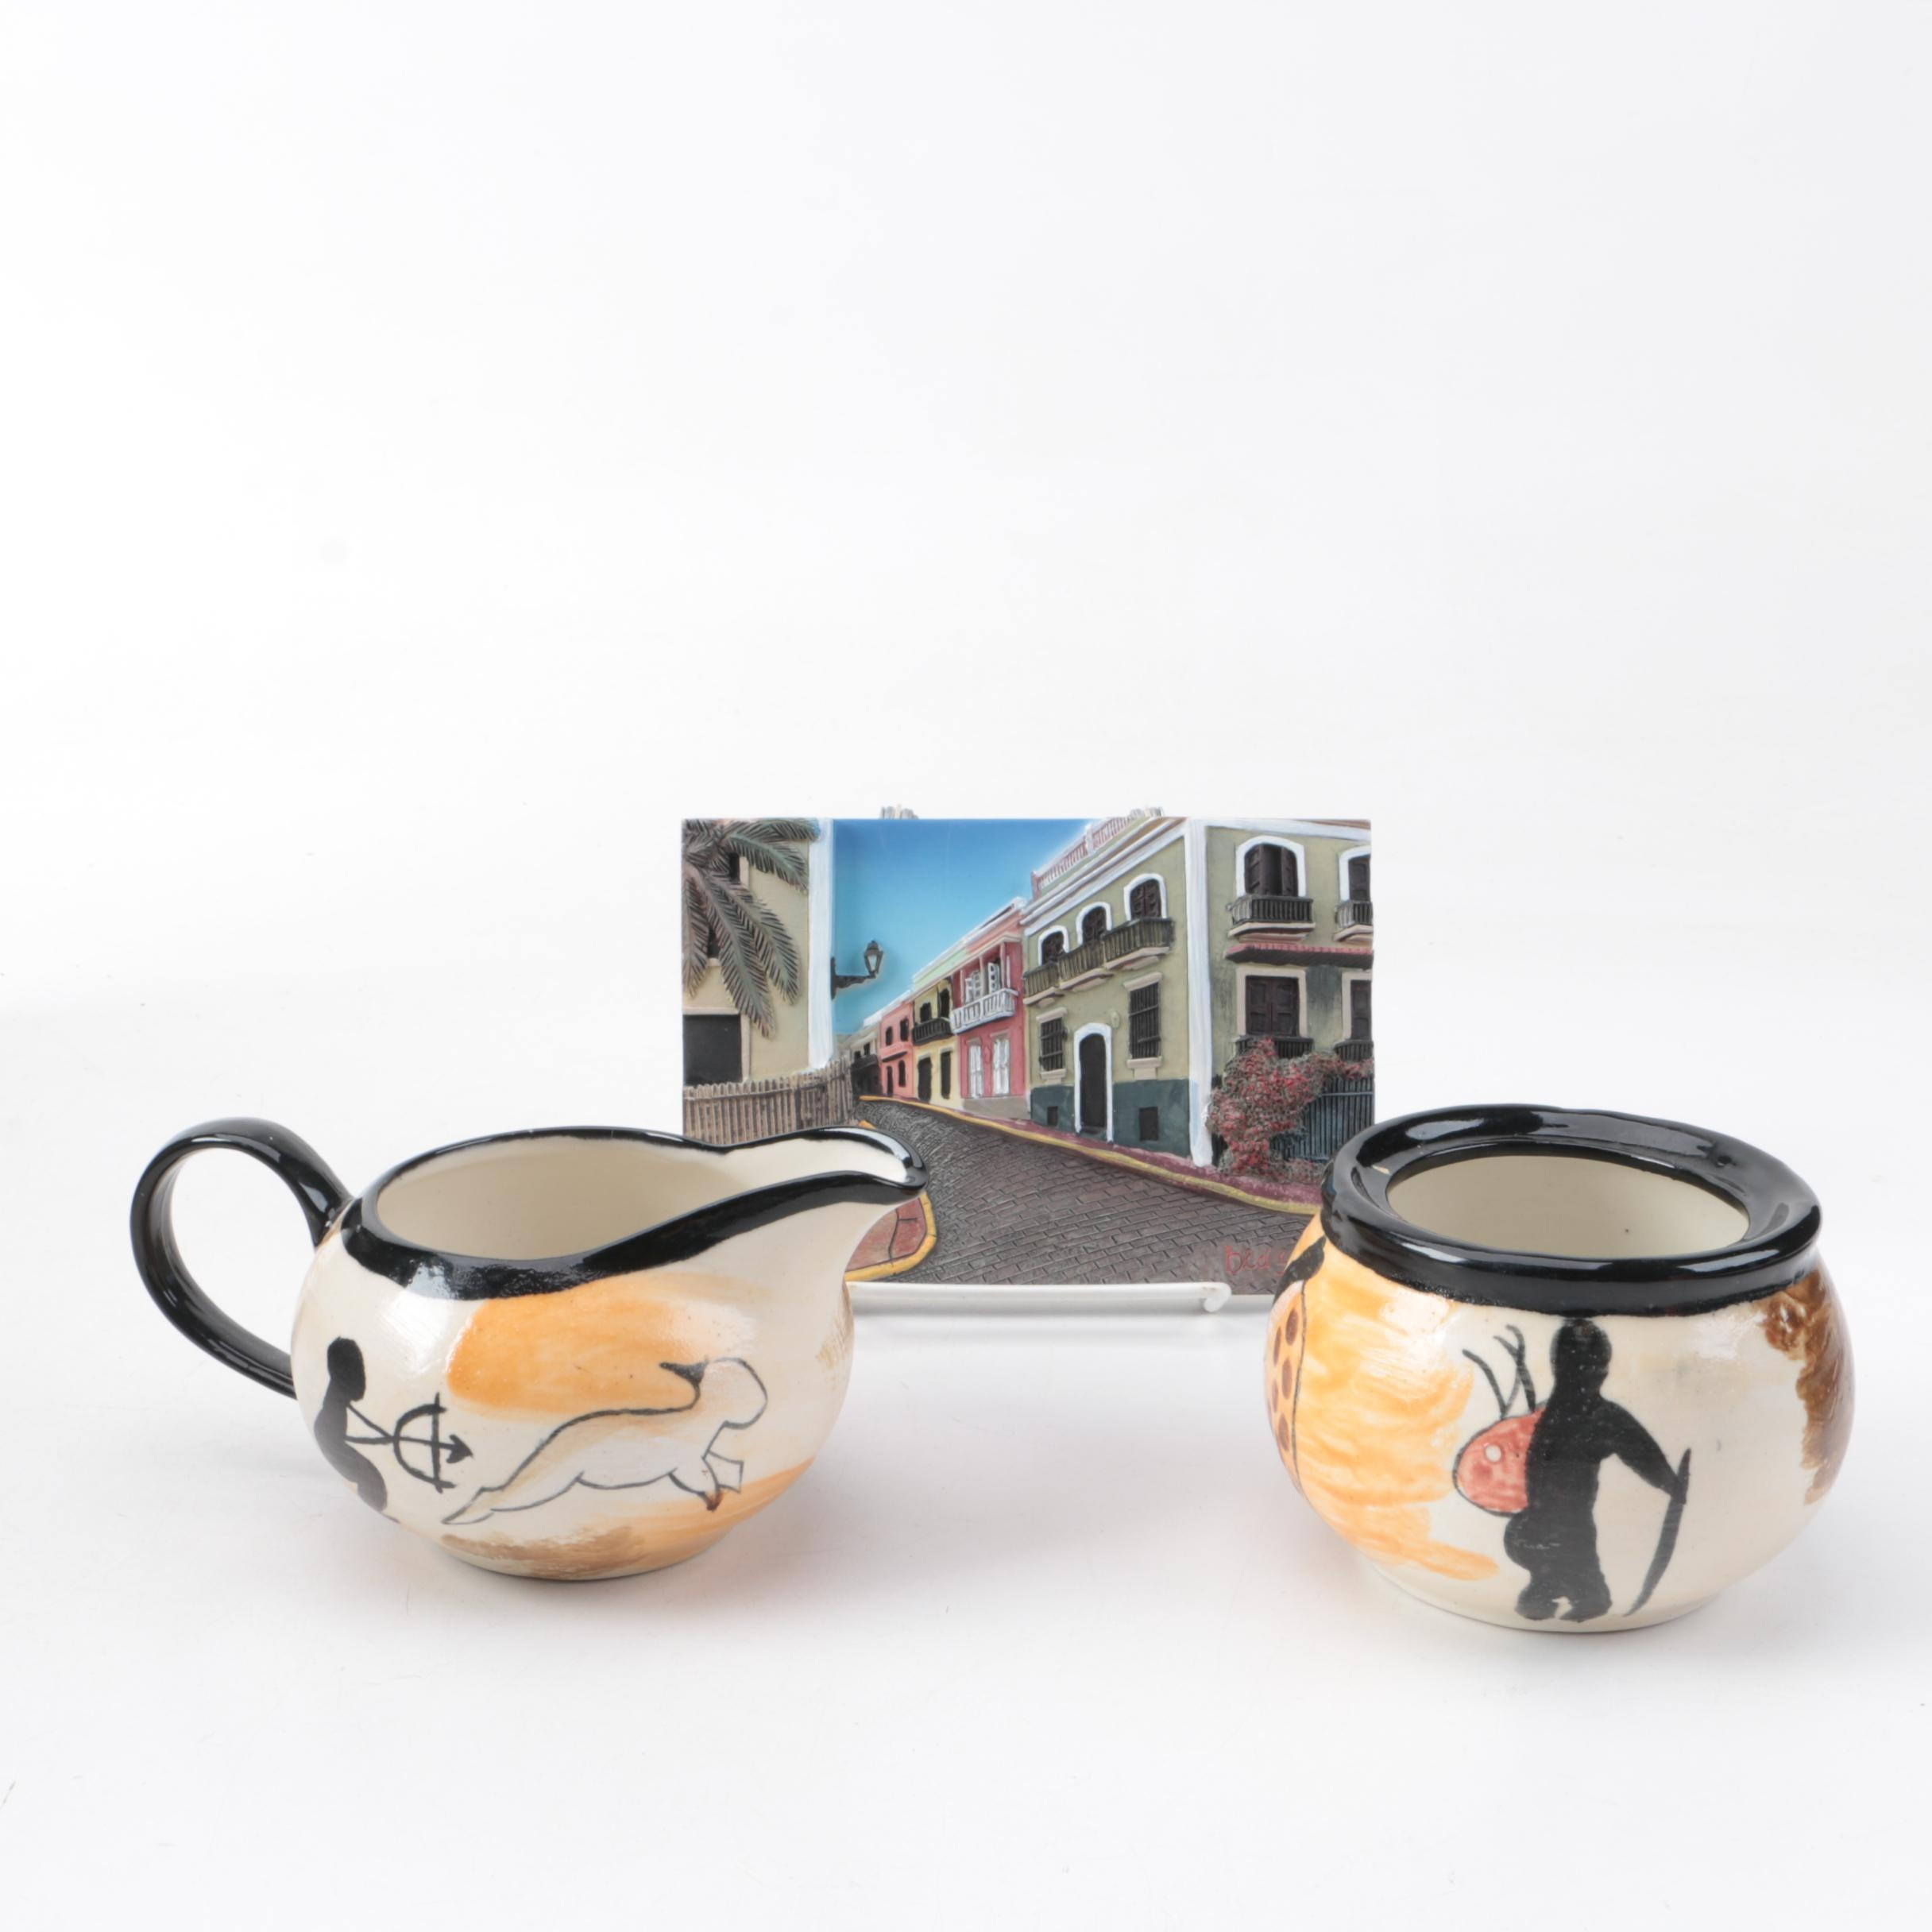 Signed Hand-Painted South African Slip Cast Tableware . & South African Dinnerware u0026 AQUARELLE BUTTERFLIES PORCELAIN TABLEWARE